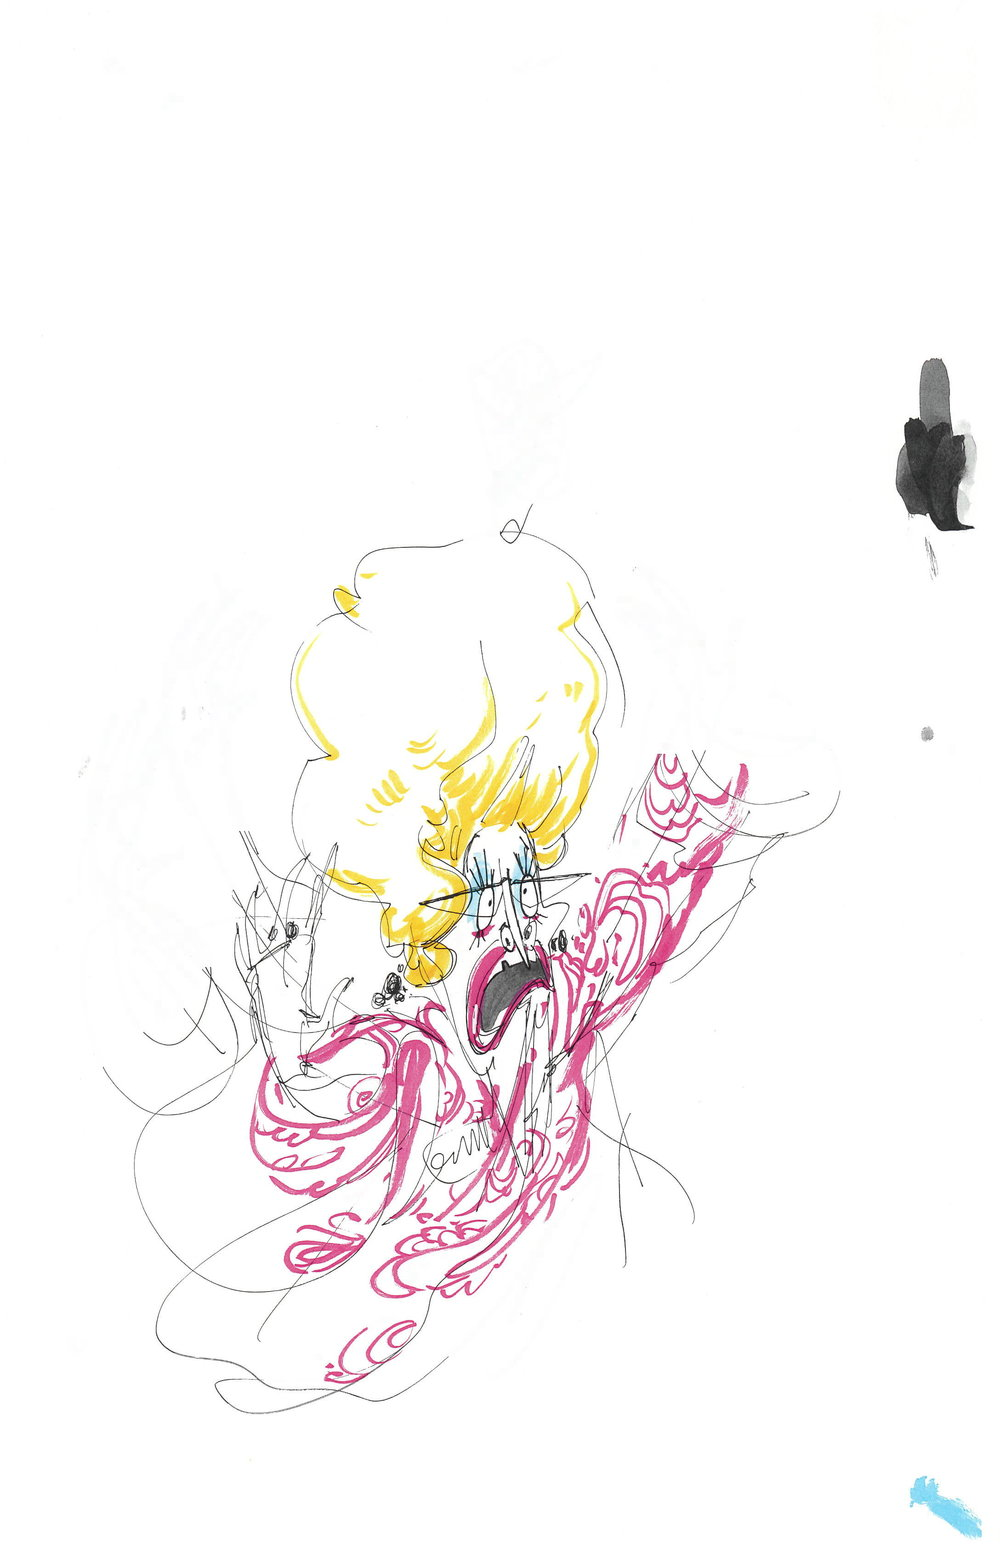 BRIANWONDERS-sketches-1_Page_08_Image_0001.jpg